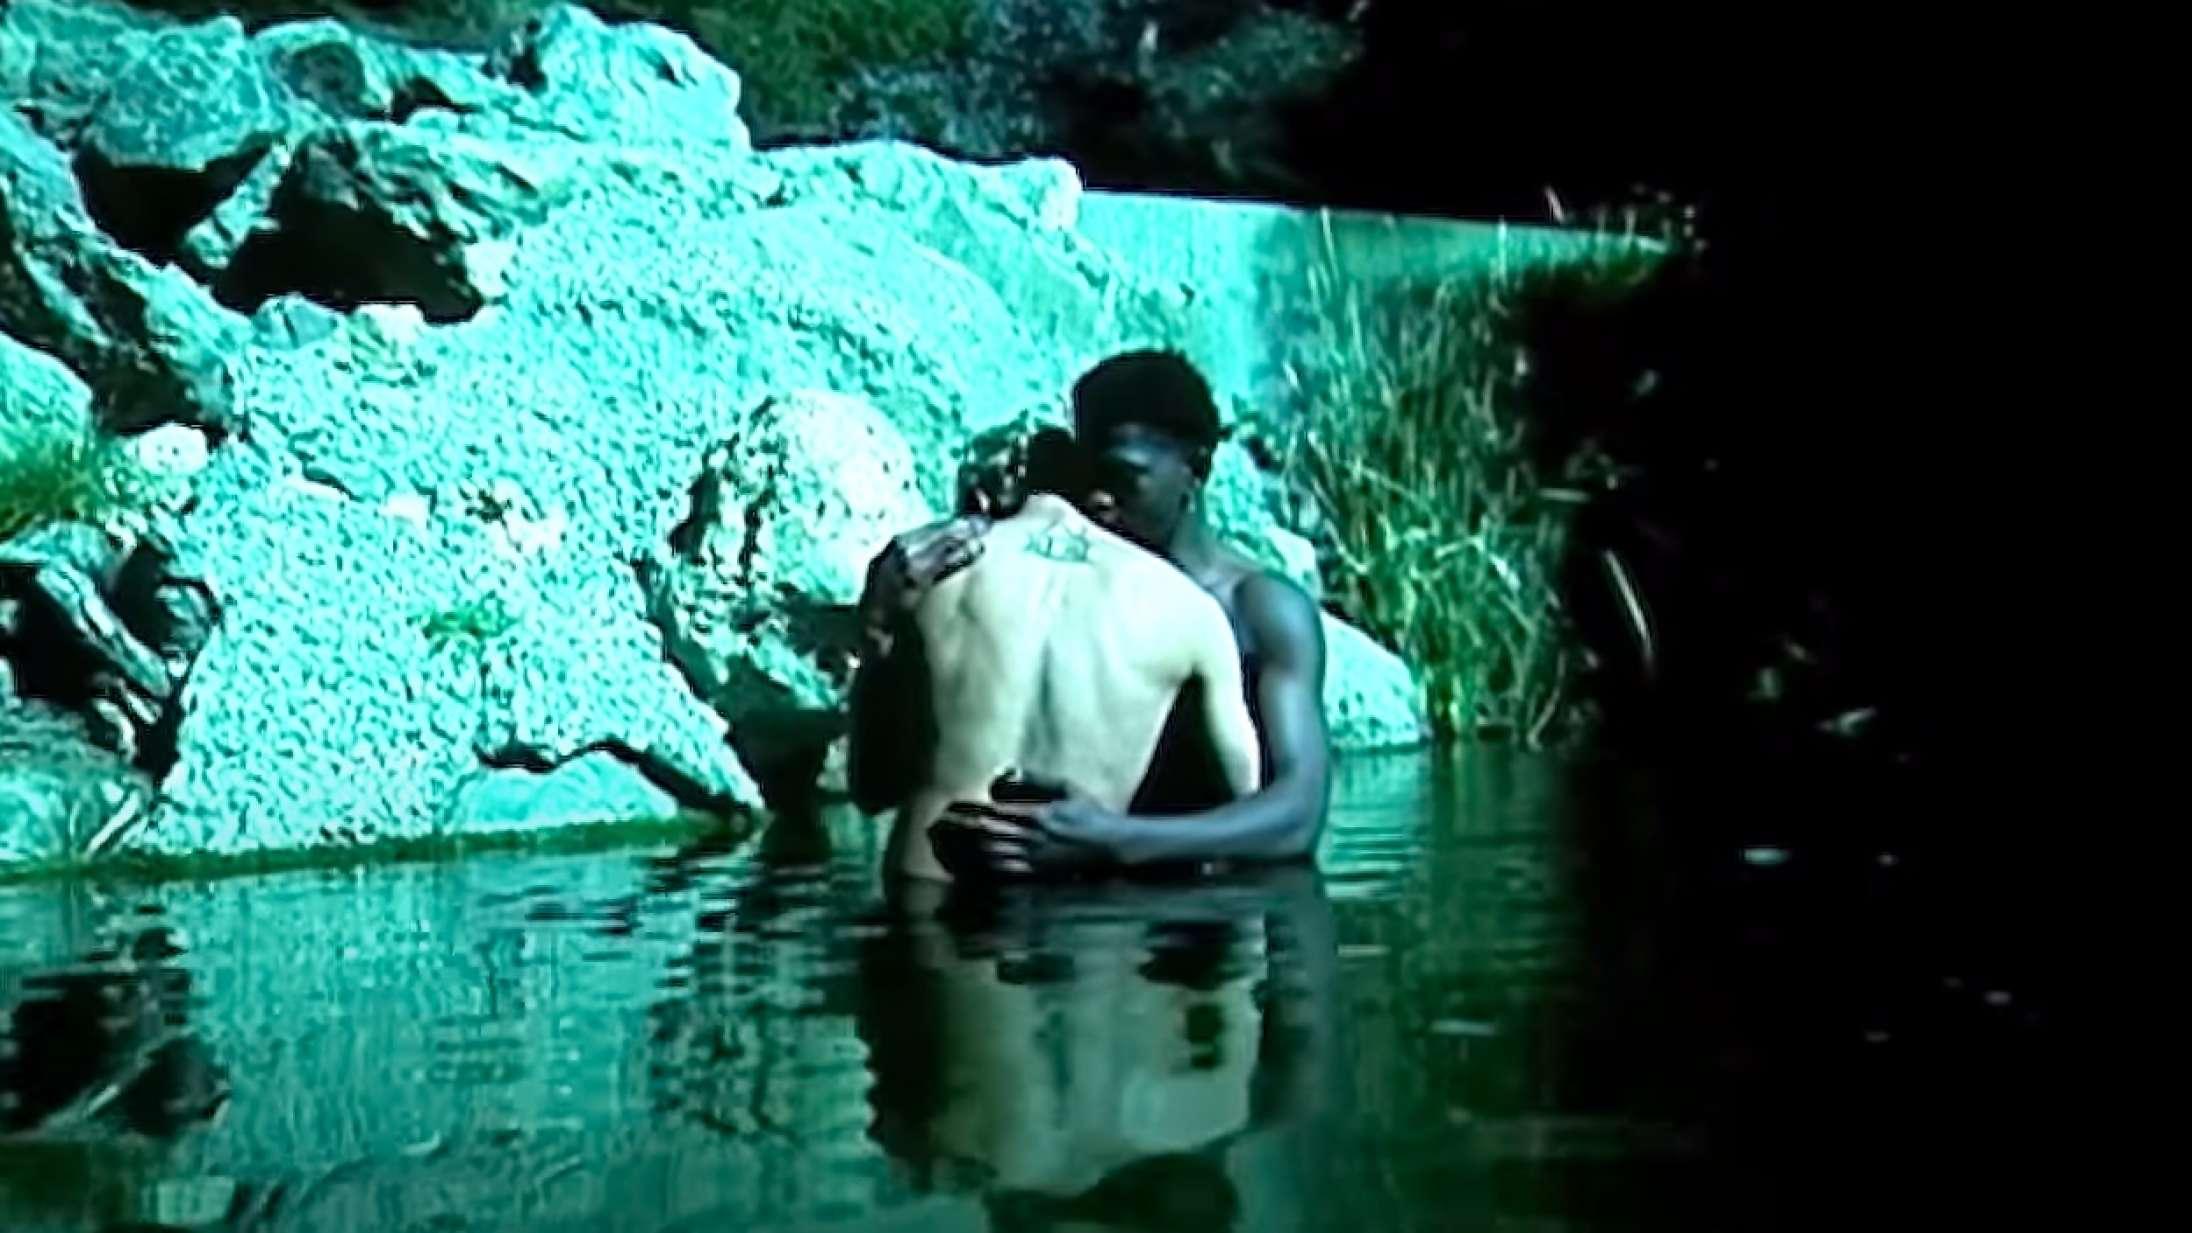 Lil Nas X tager på roadtrip i ny Brockhampton-musikvideo – inklusive syretrip og nøgenbadning